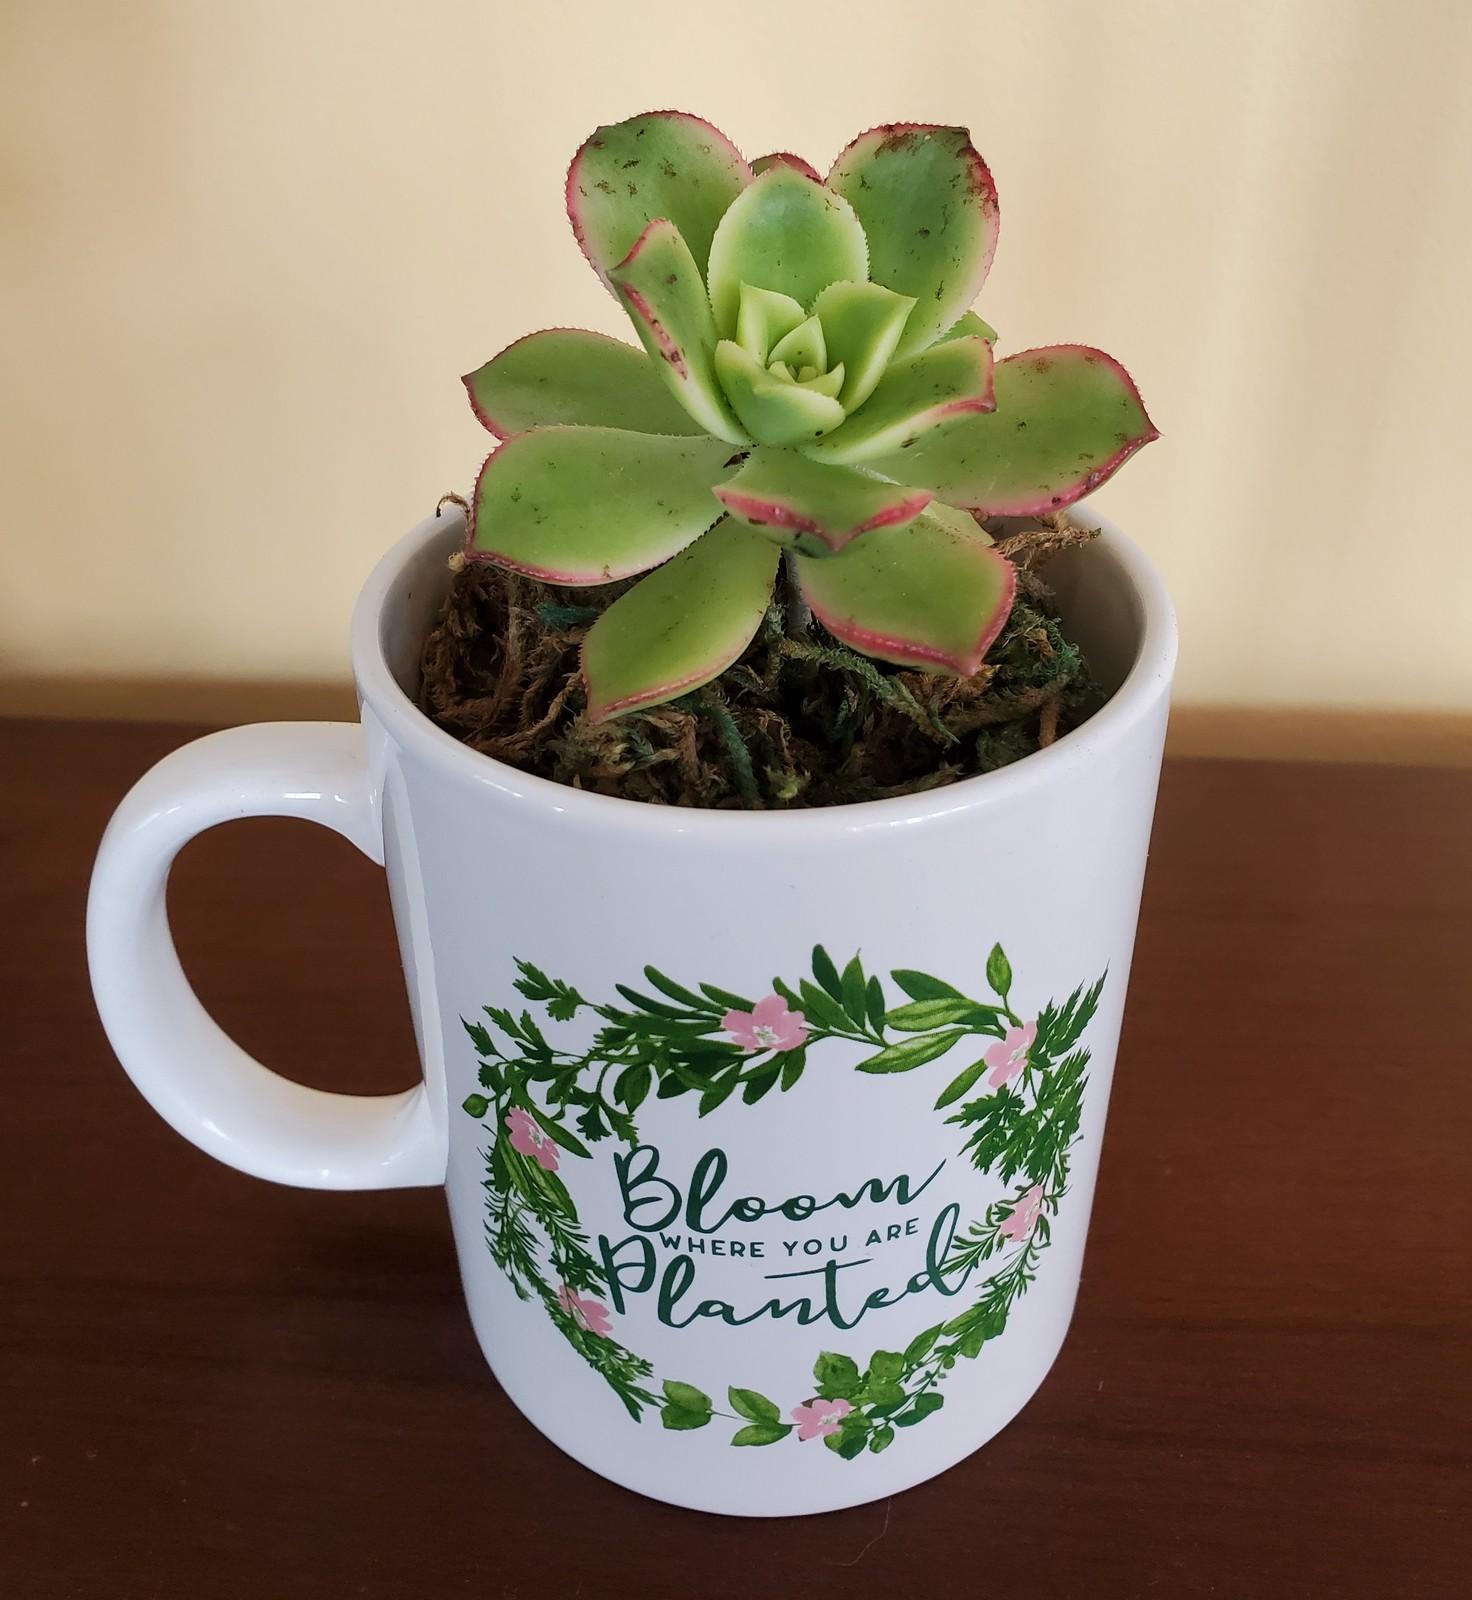 Aeonium bloomwhereplanted 1